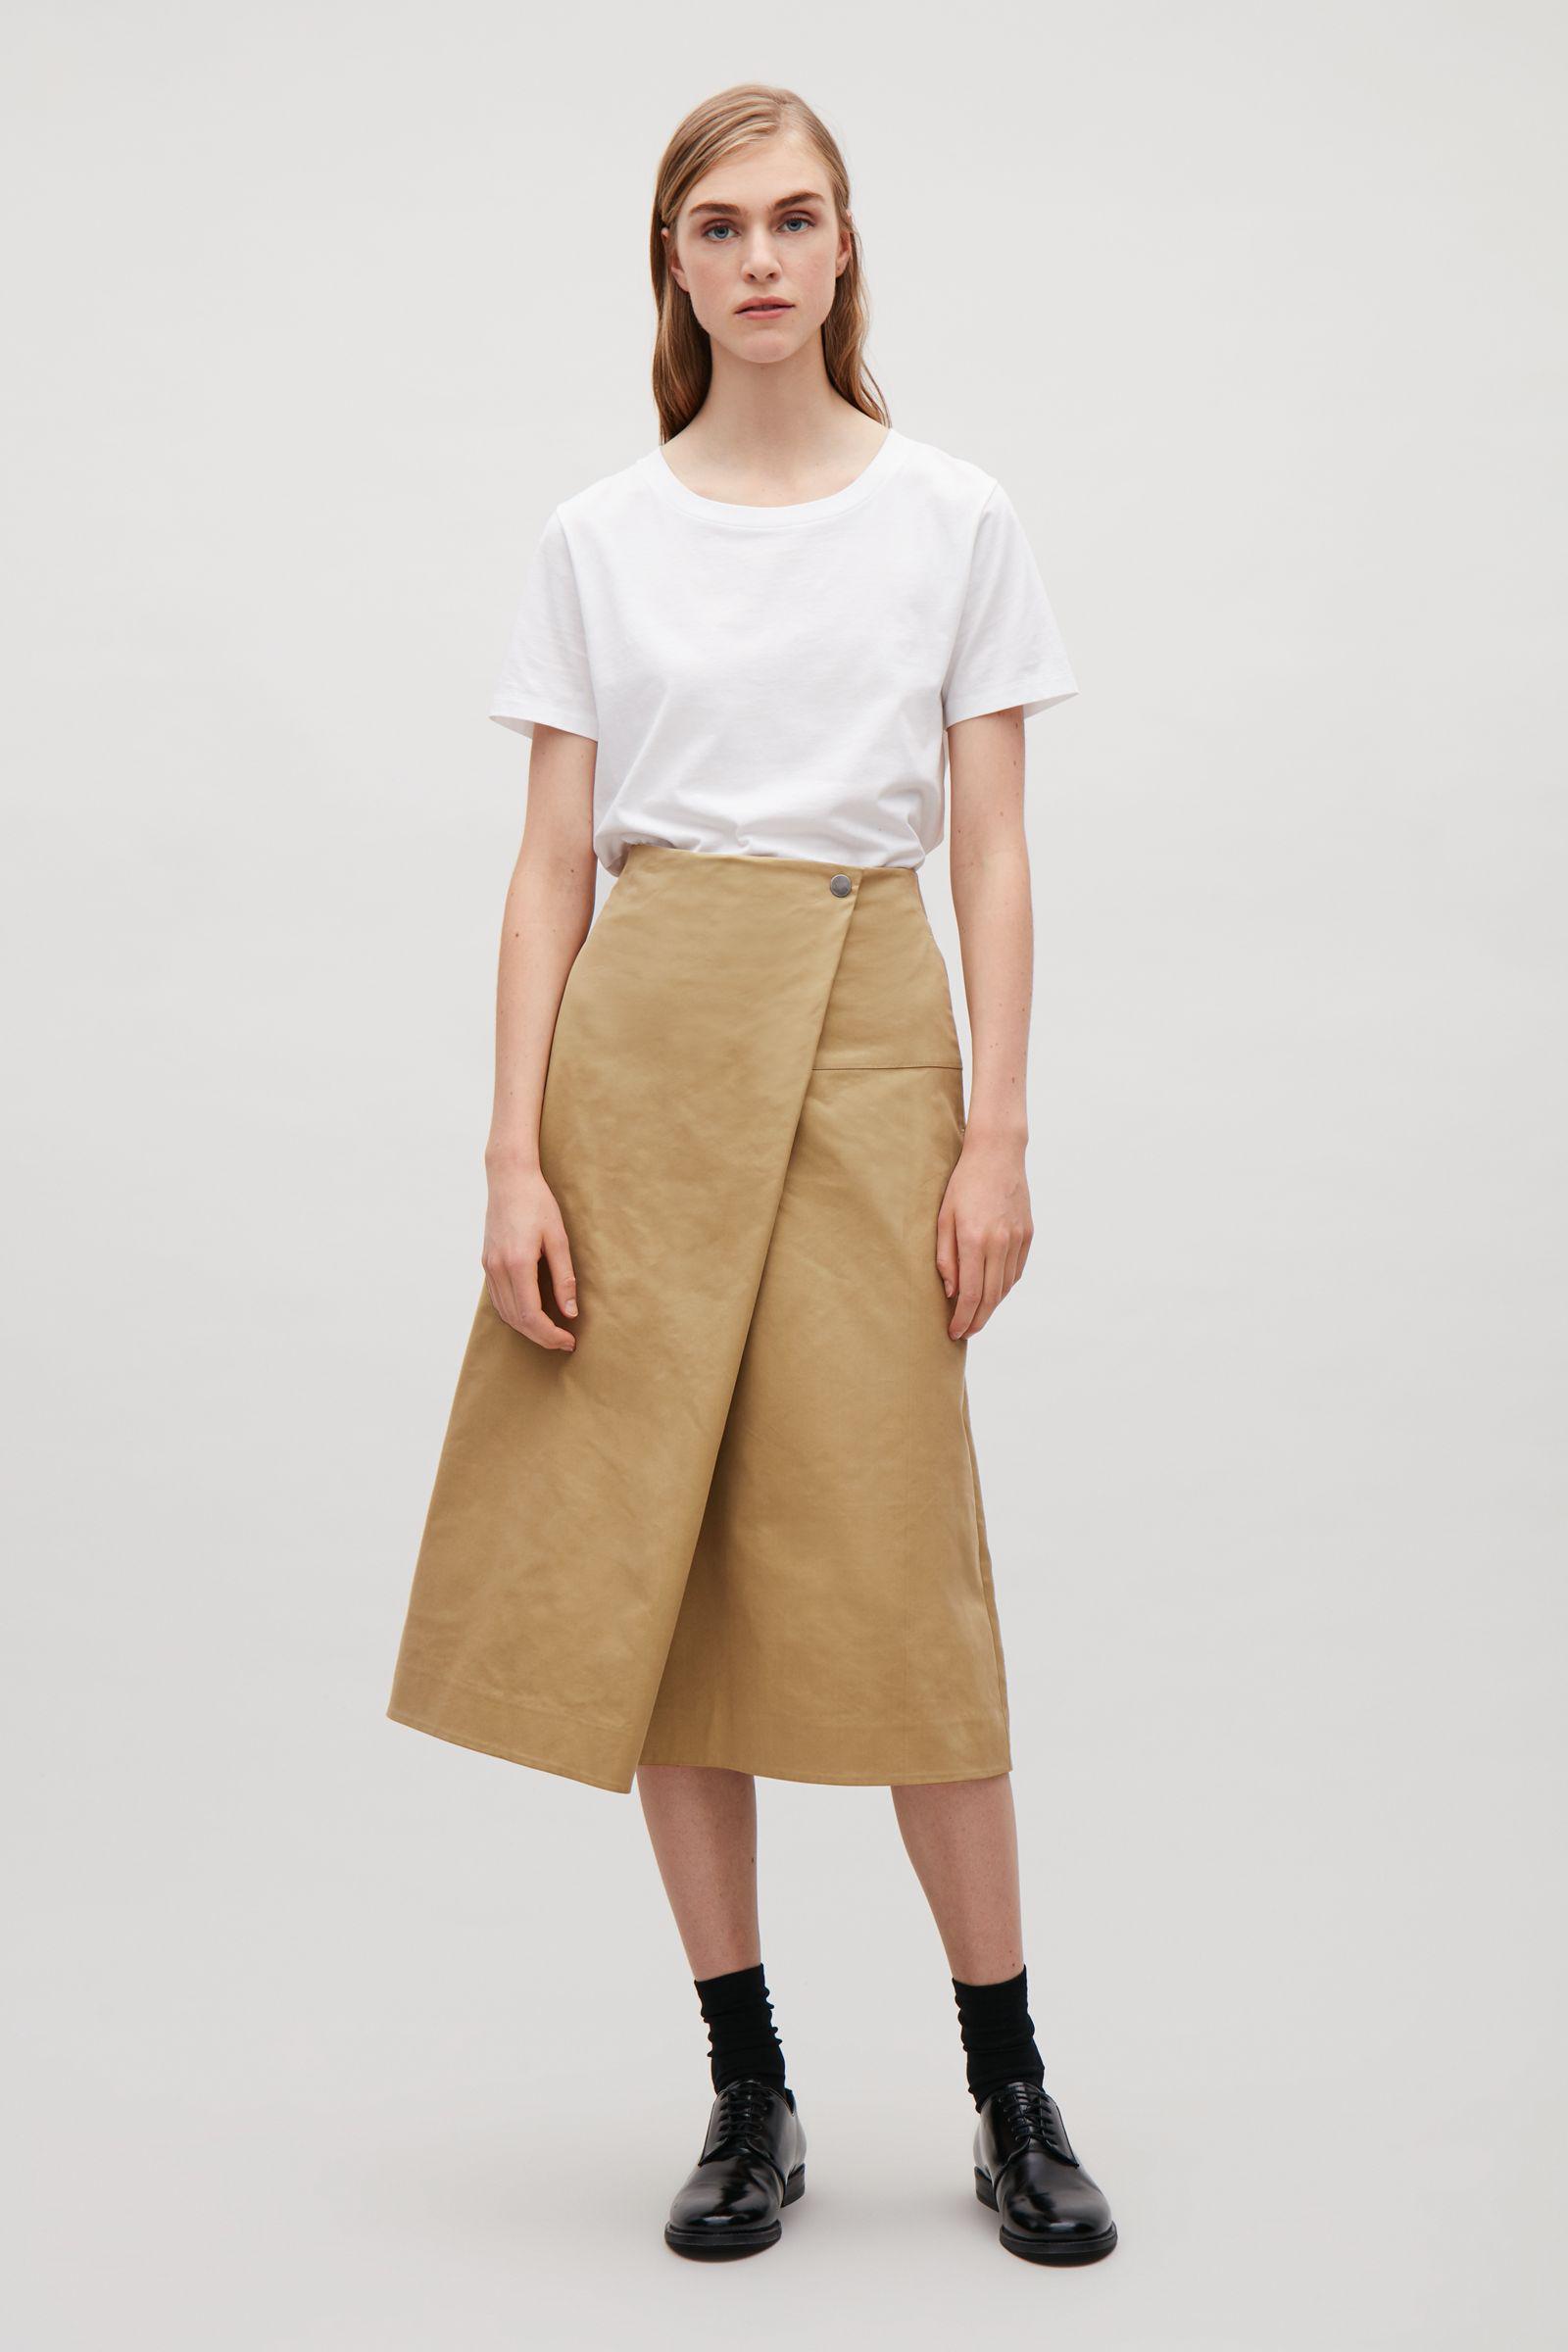 88143631076 Lyst - COS A-line Skirt With Asymmetric Fold